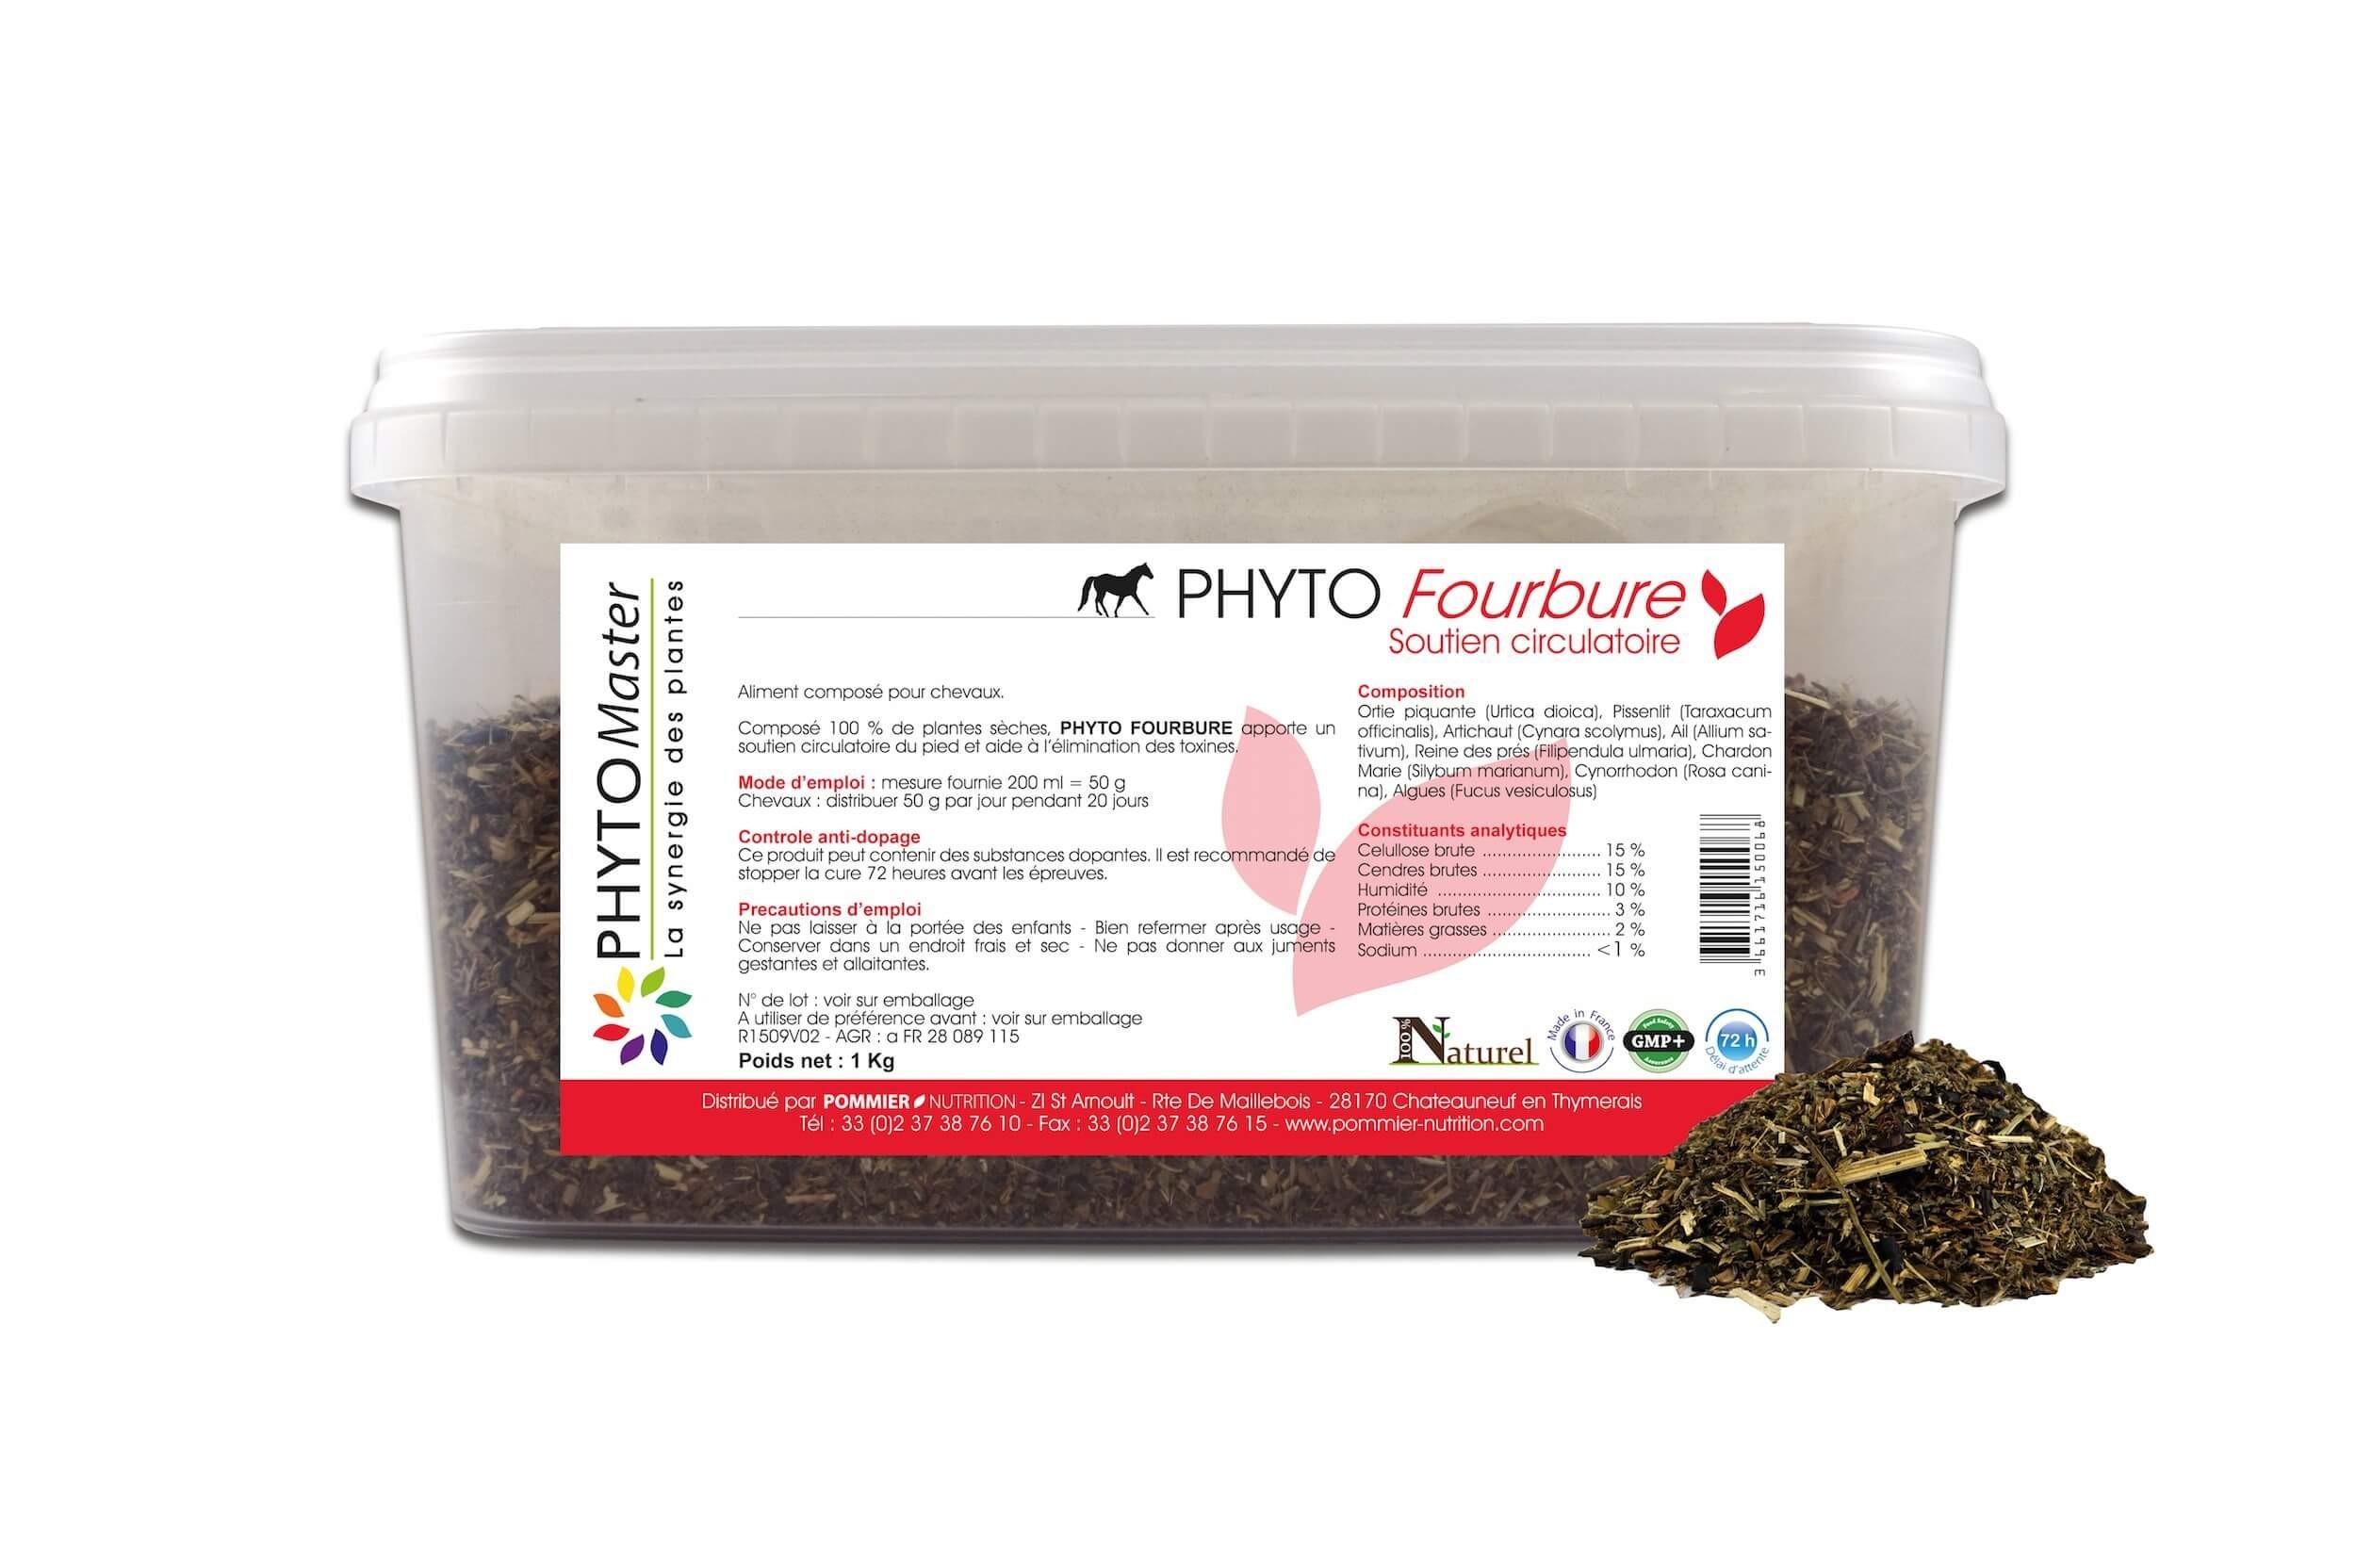 Phyto Master Fourbure 1 kg - La Compagnie des Animaux